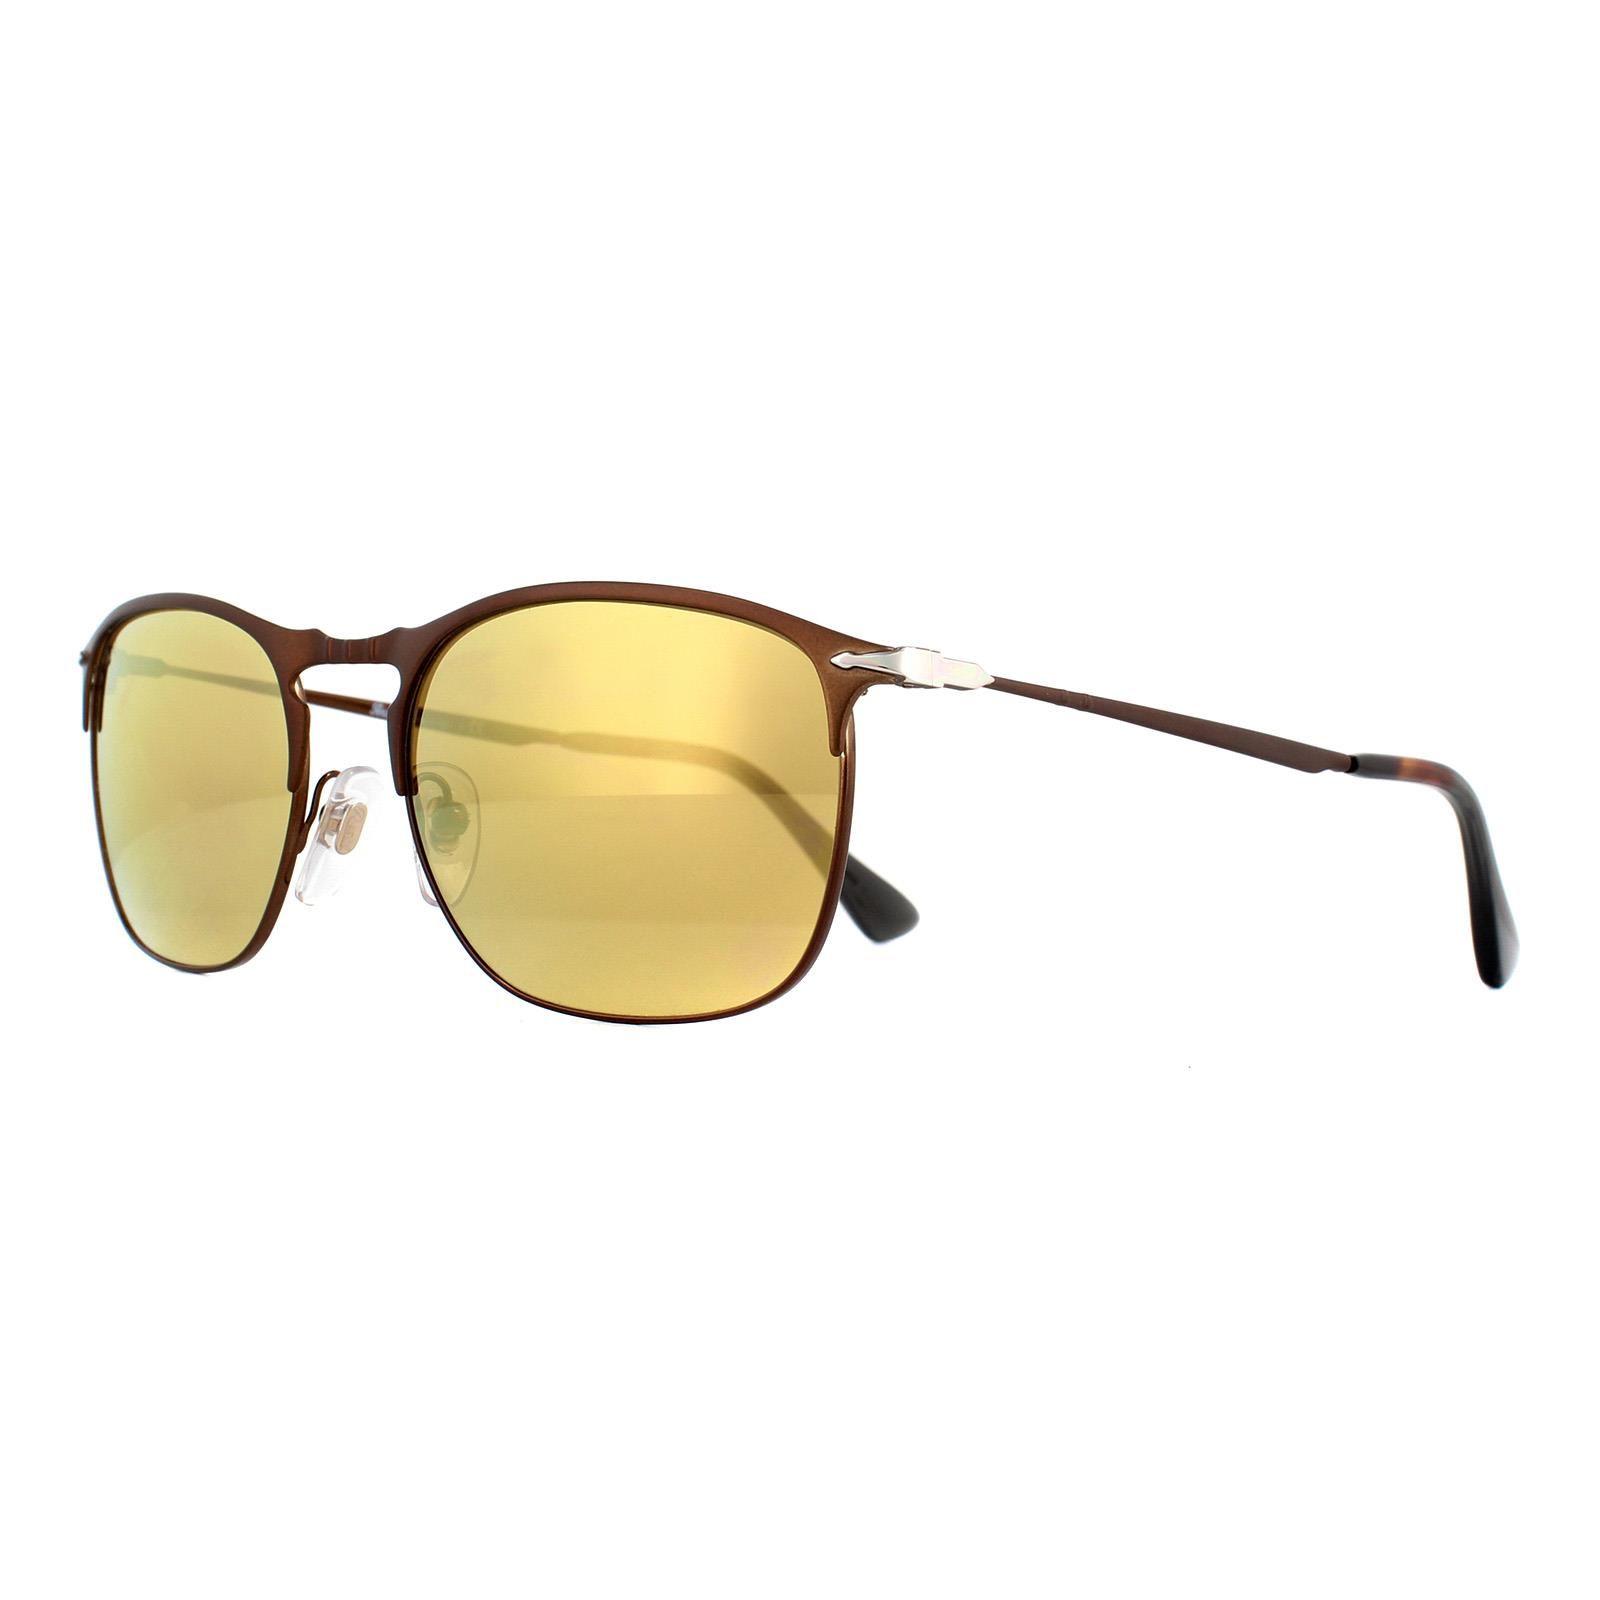 Persol Sunglasses 7359S 1072W4 Matt Brown Light Brown Gold Mirror 55mm